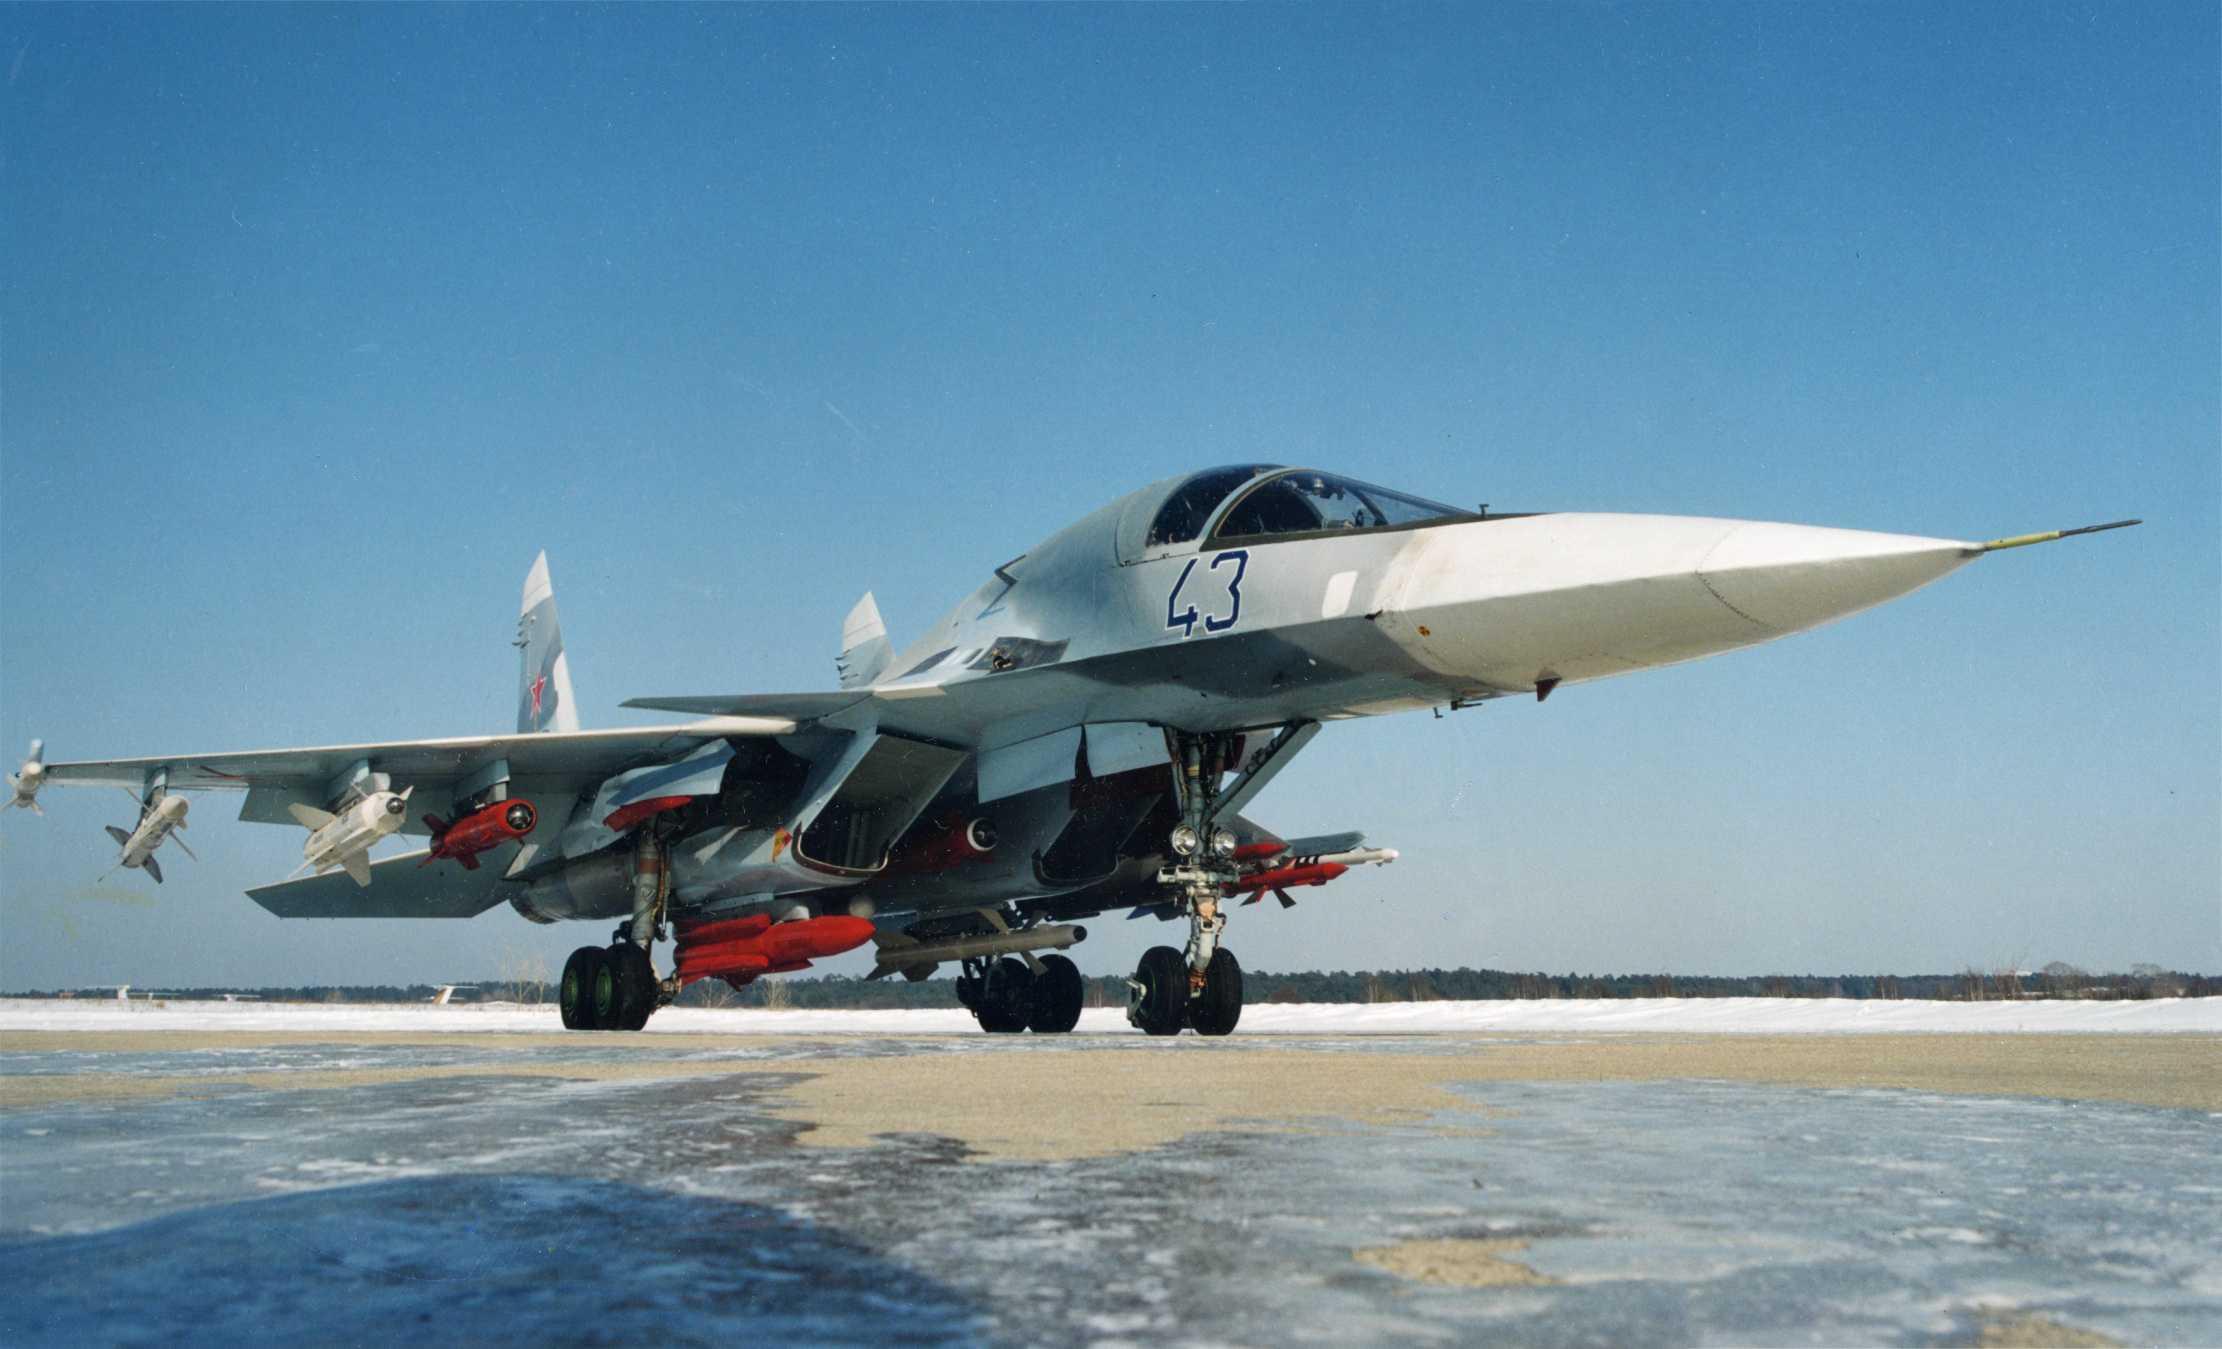 Chiến cơ ném bom Su-34 của Nga